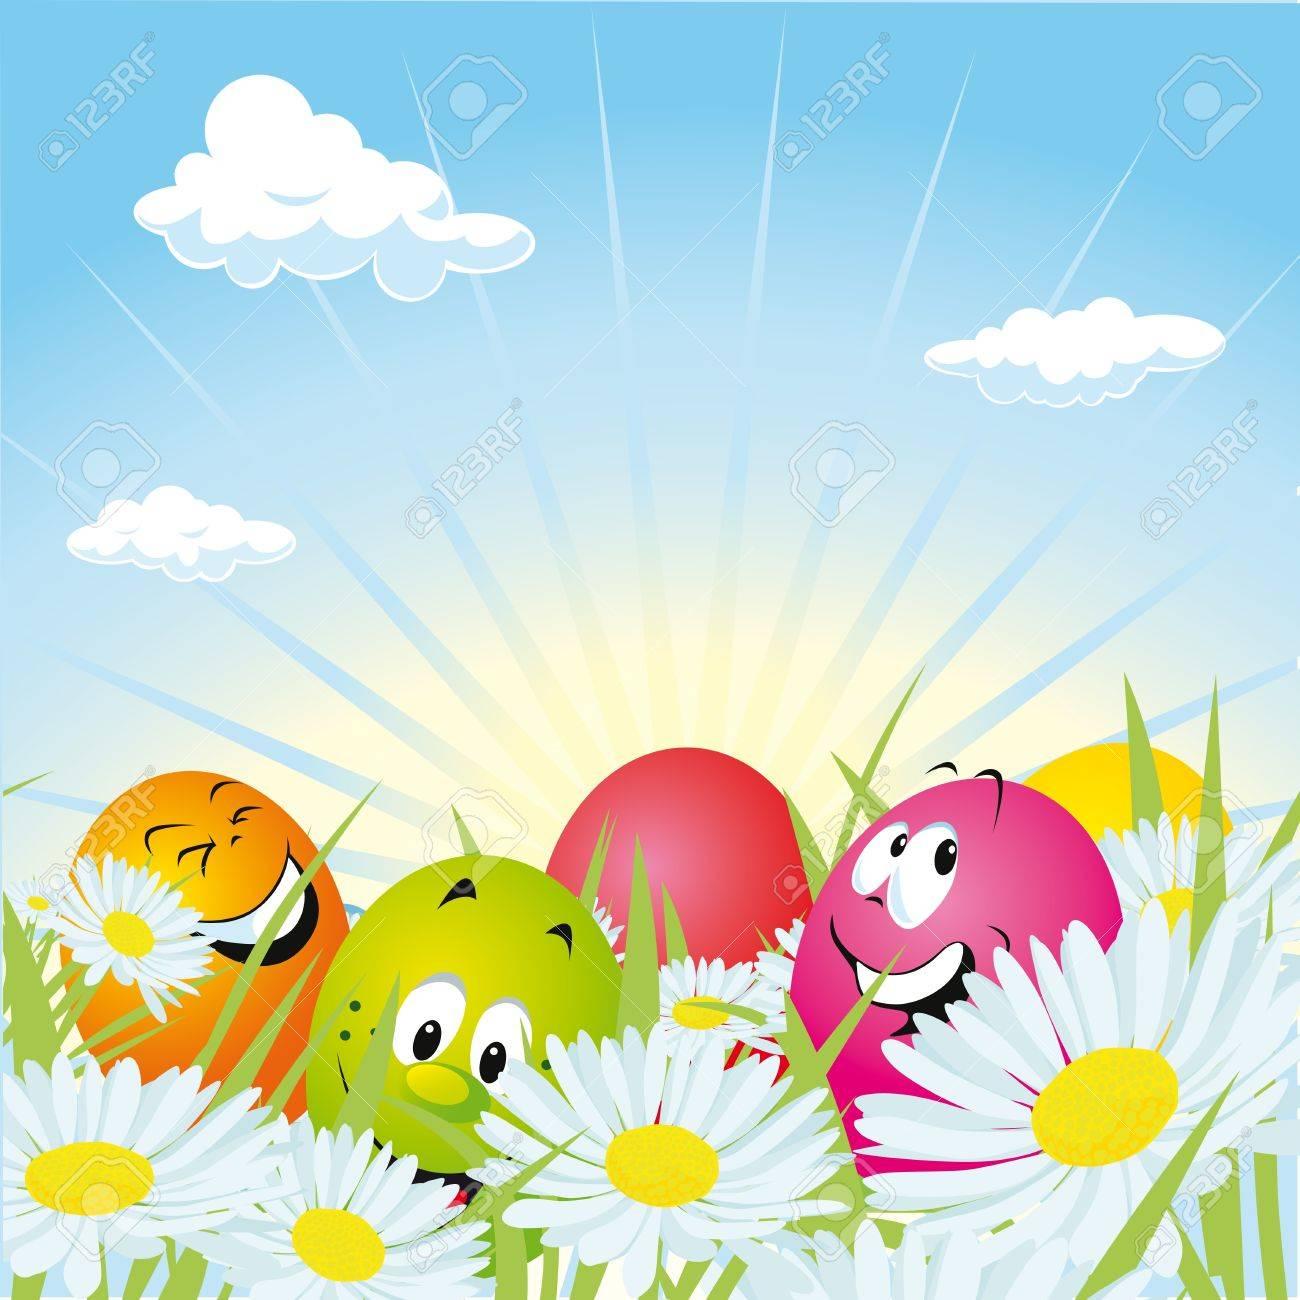 easter eggs hidden in daisy field royalty free cliparts vectors